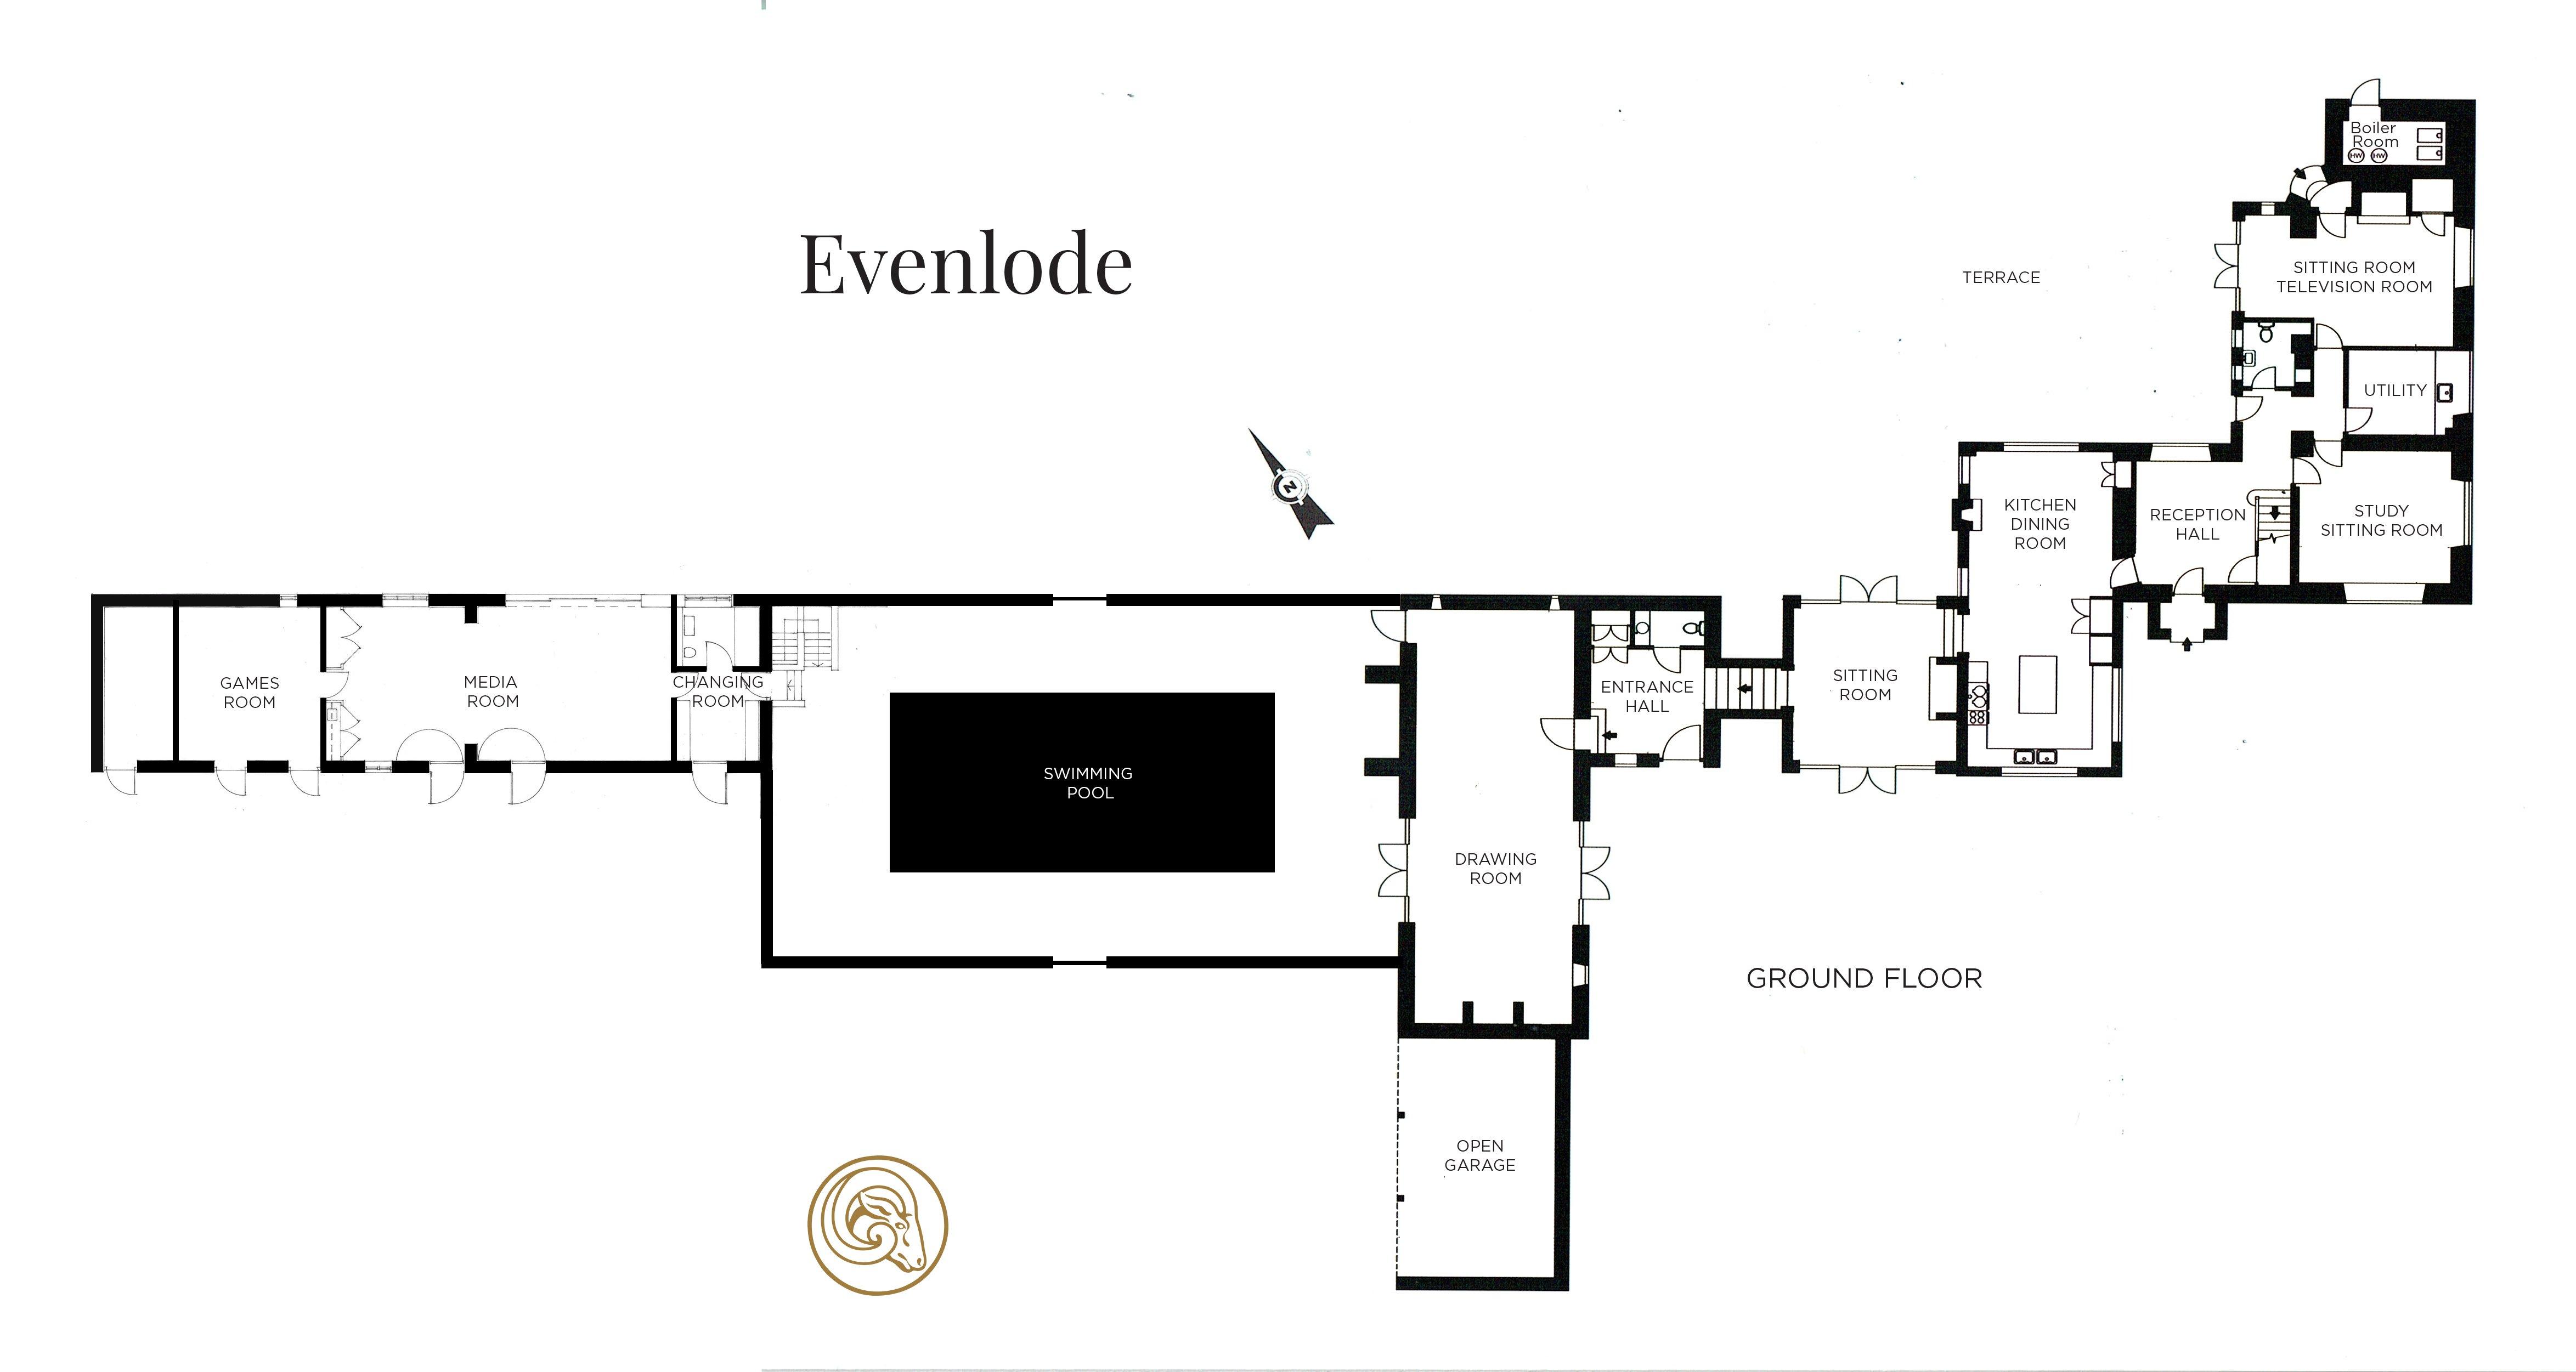 View the floorplan of Home Farm Evenlode